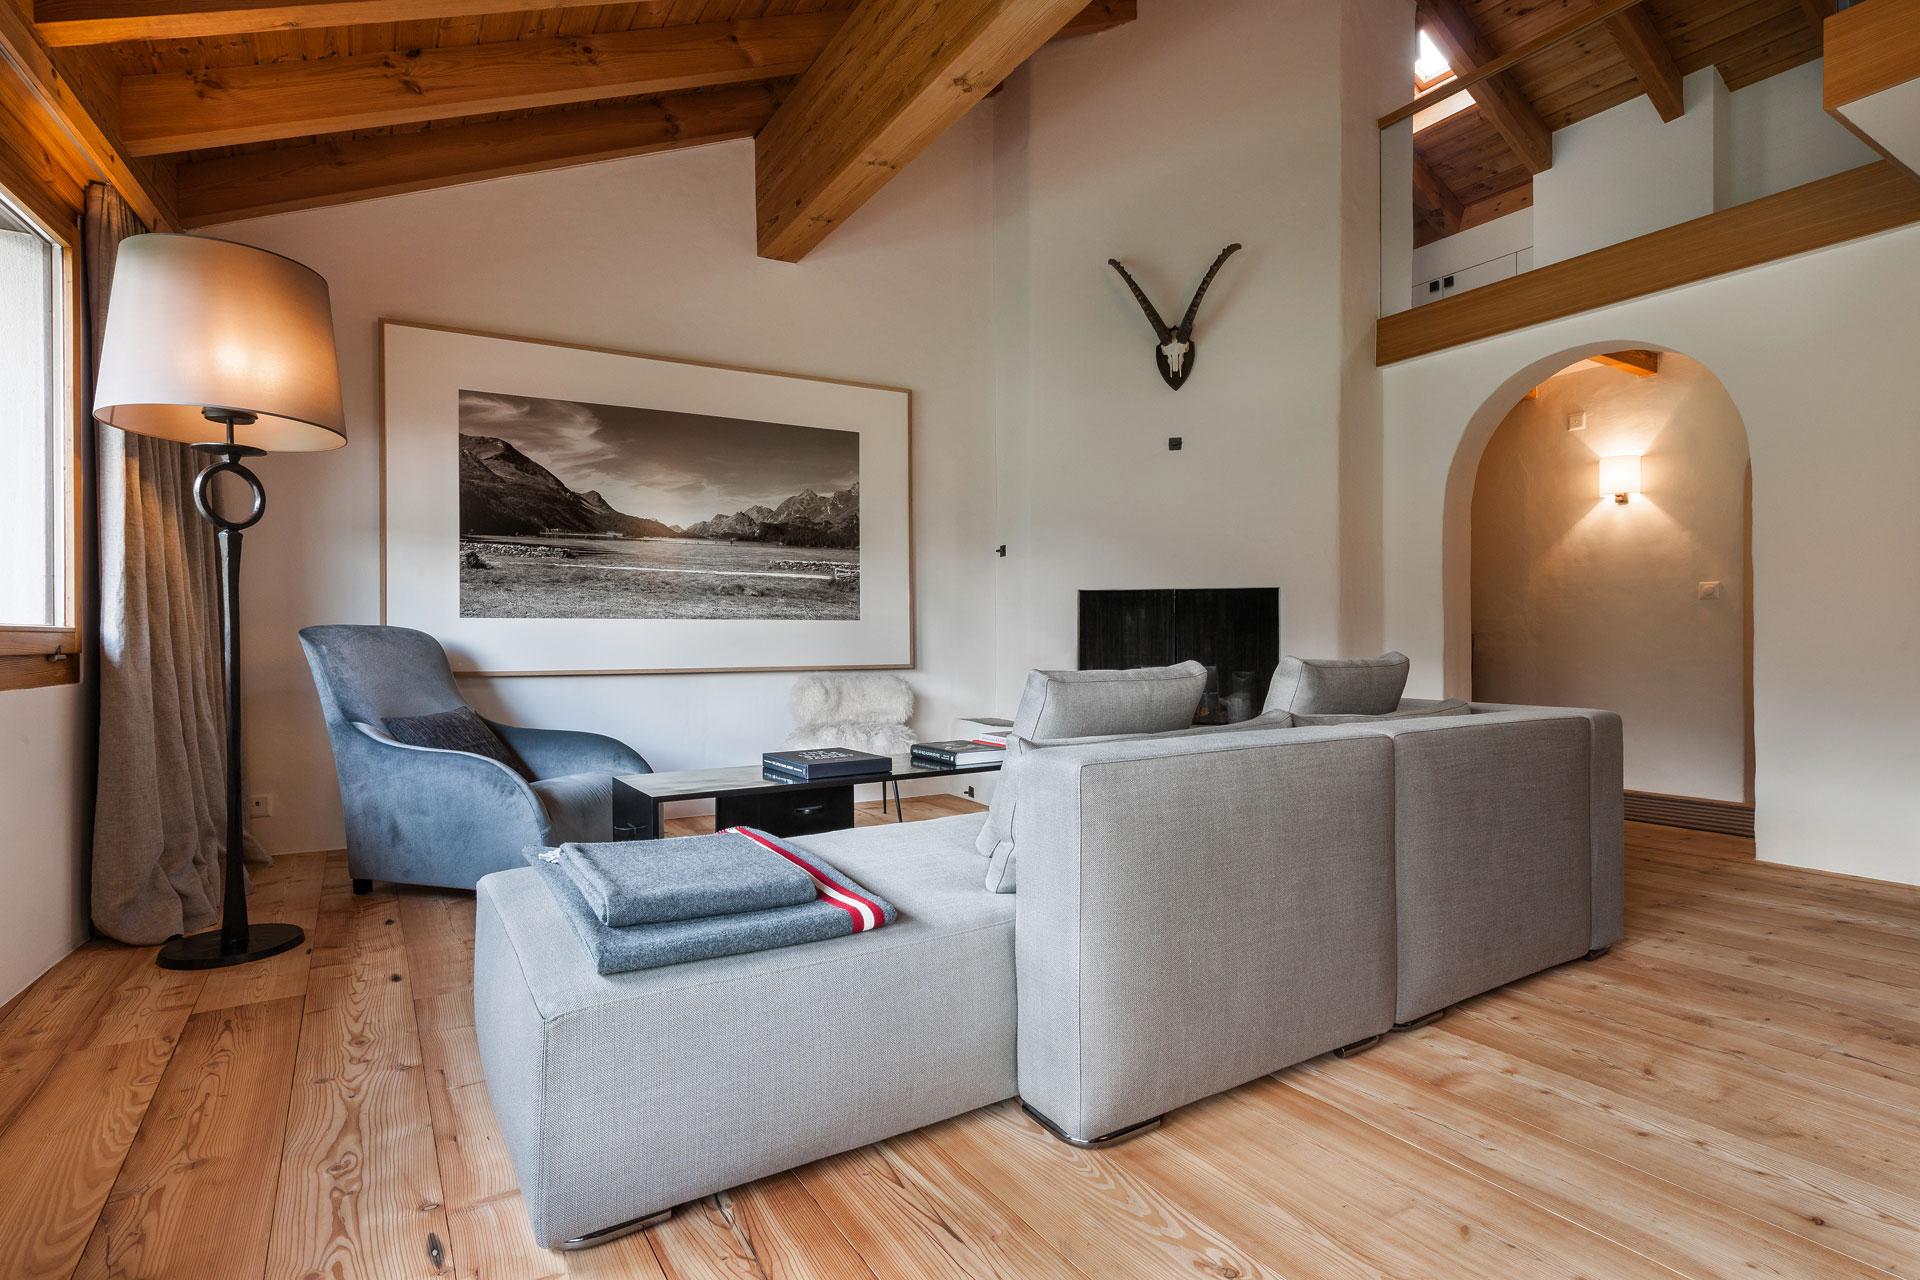 170_iria_degen_interiors_apartment_champfer1.jpg